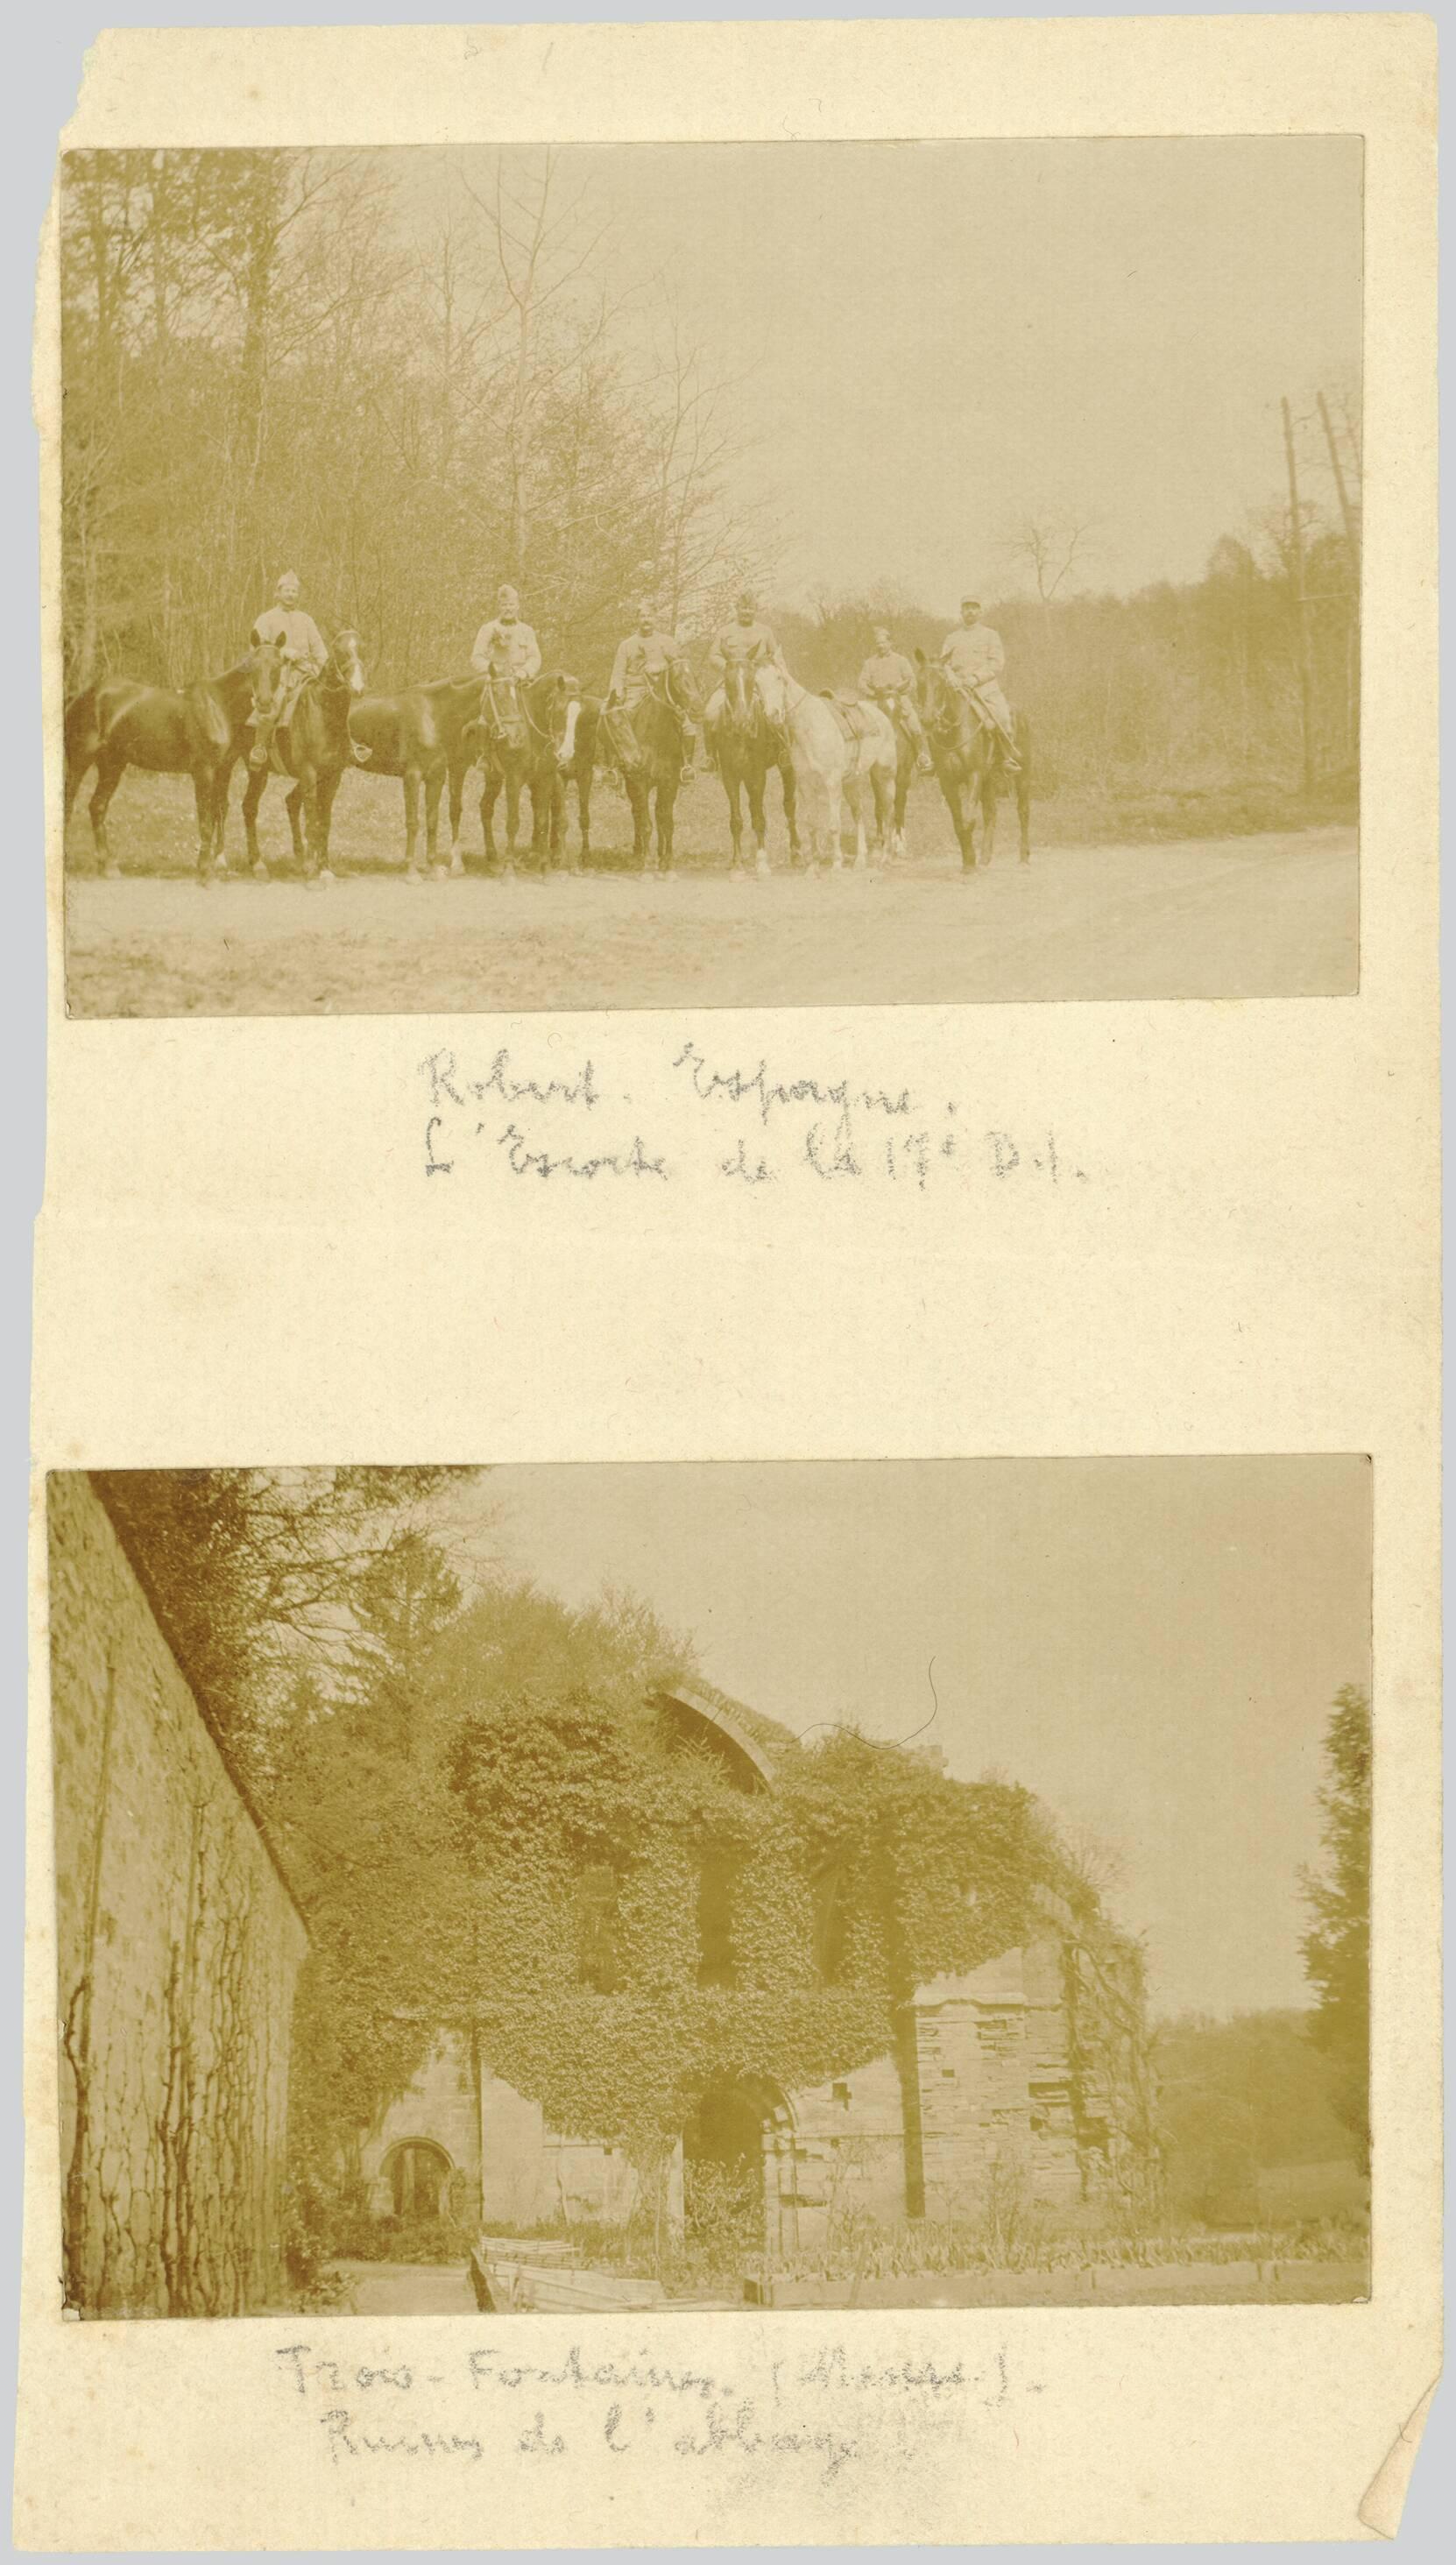 ROBERT-ESPAGNE. L'ESCORTE DE LA 17E D.I. TROIS-FONTAINES (MEUSE). RUINES DE L'ABBAYE